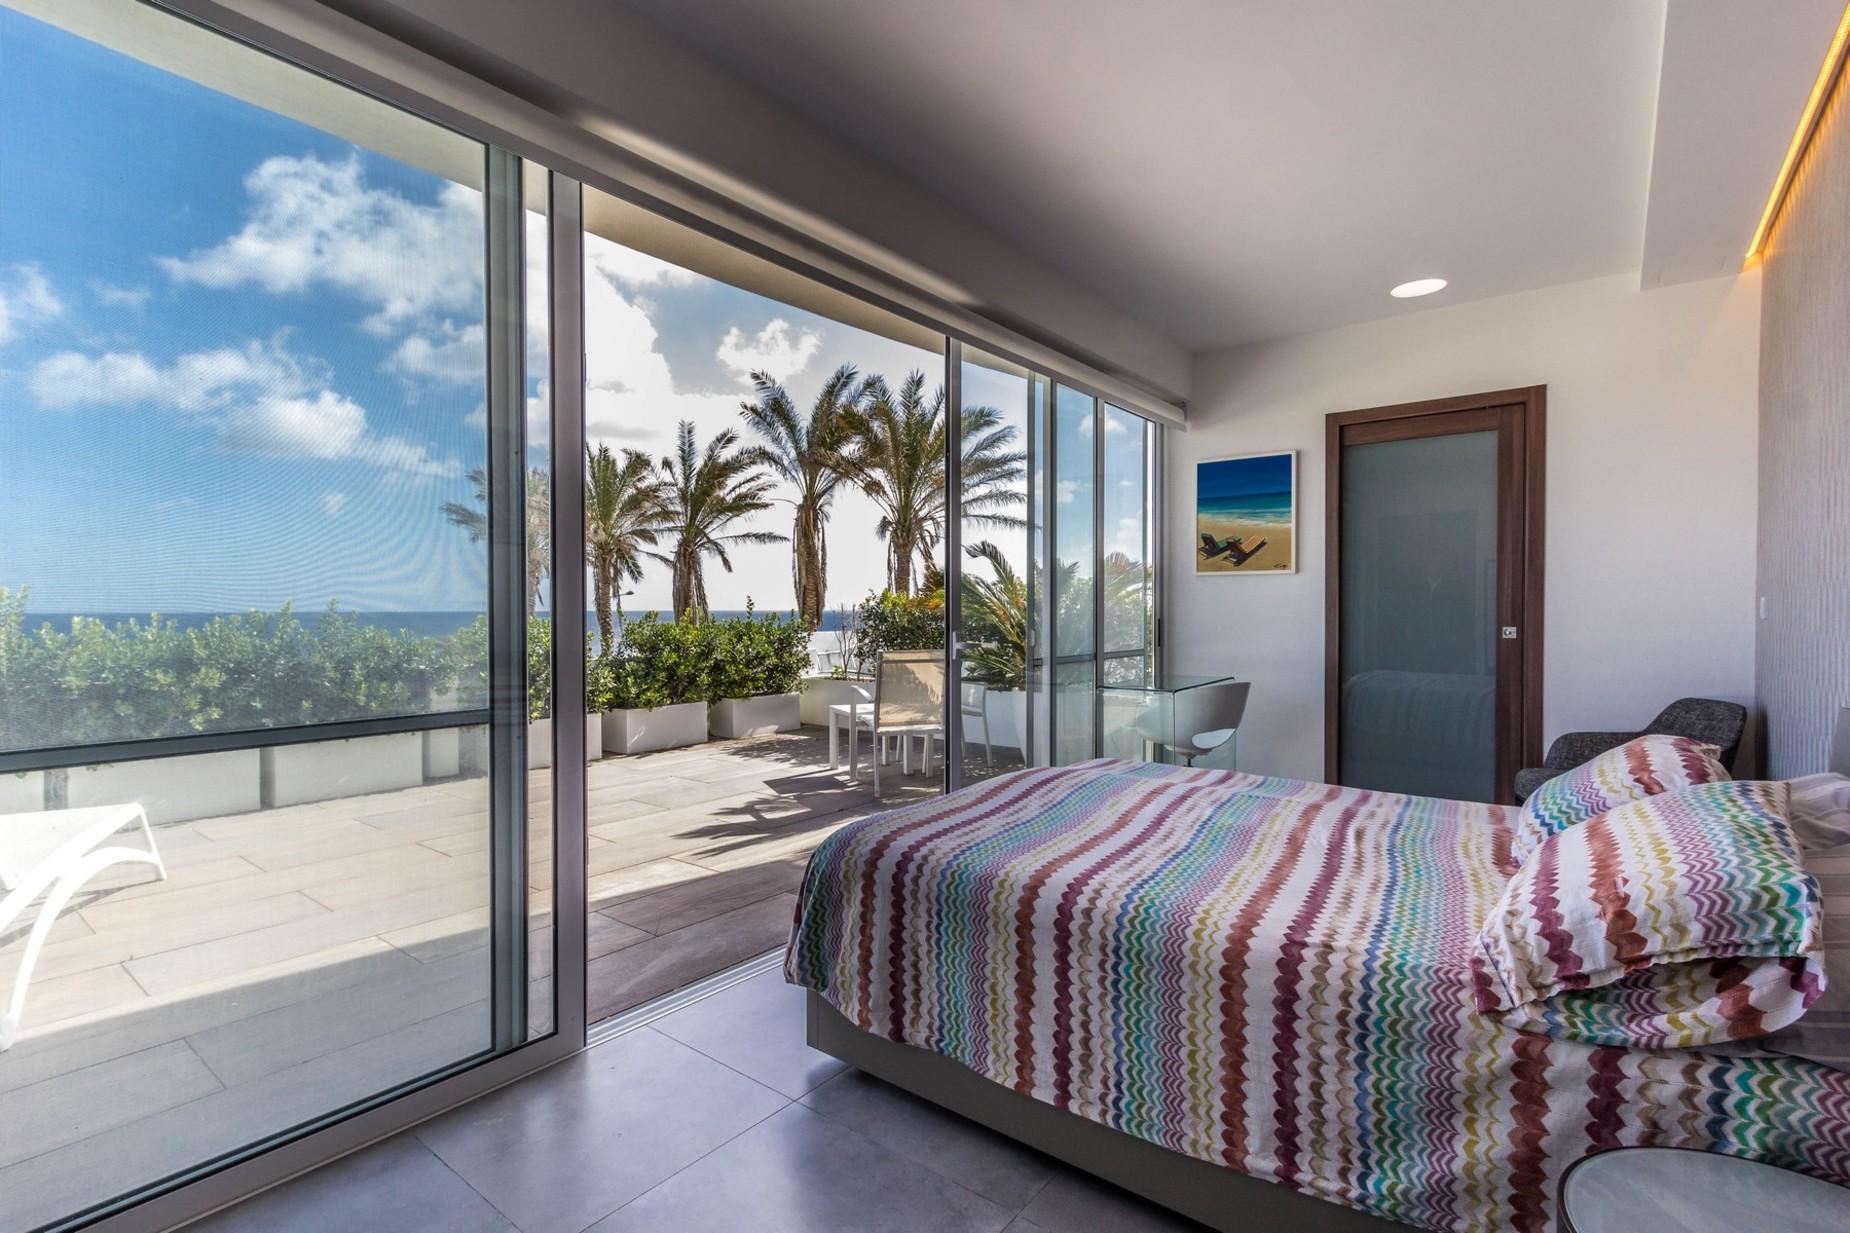 4 bed Villa For Rent in Marsascala, Marsascala - thumb 17